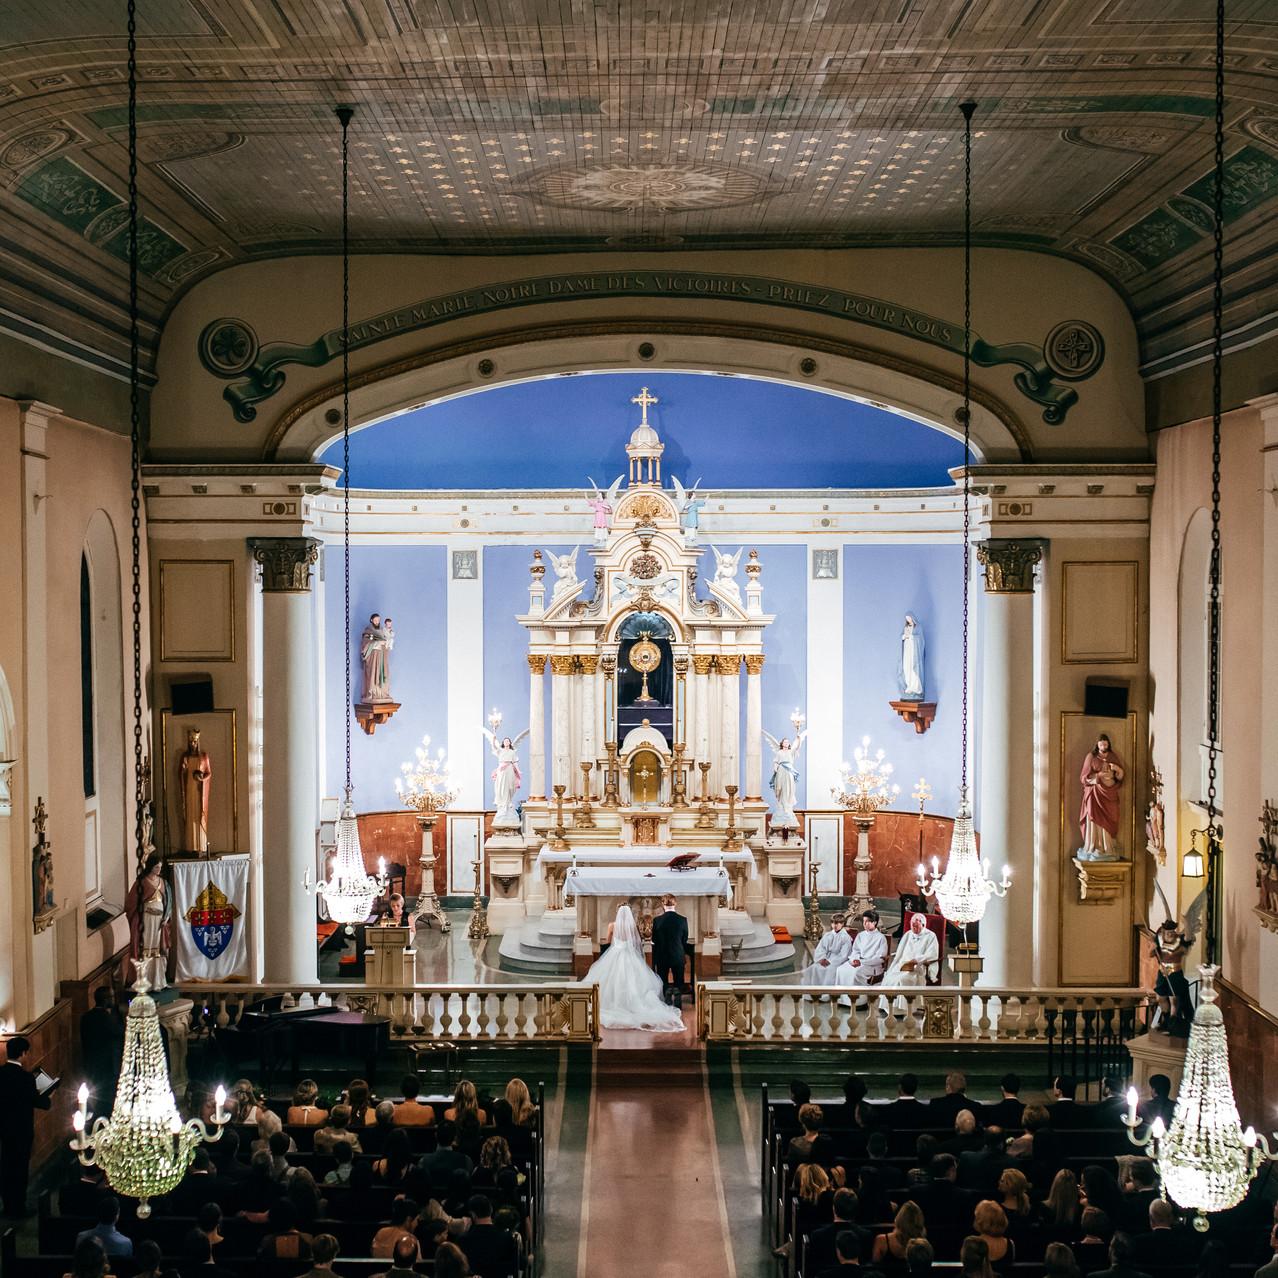 TaylorStewart-Wedding-Ceremony-96